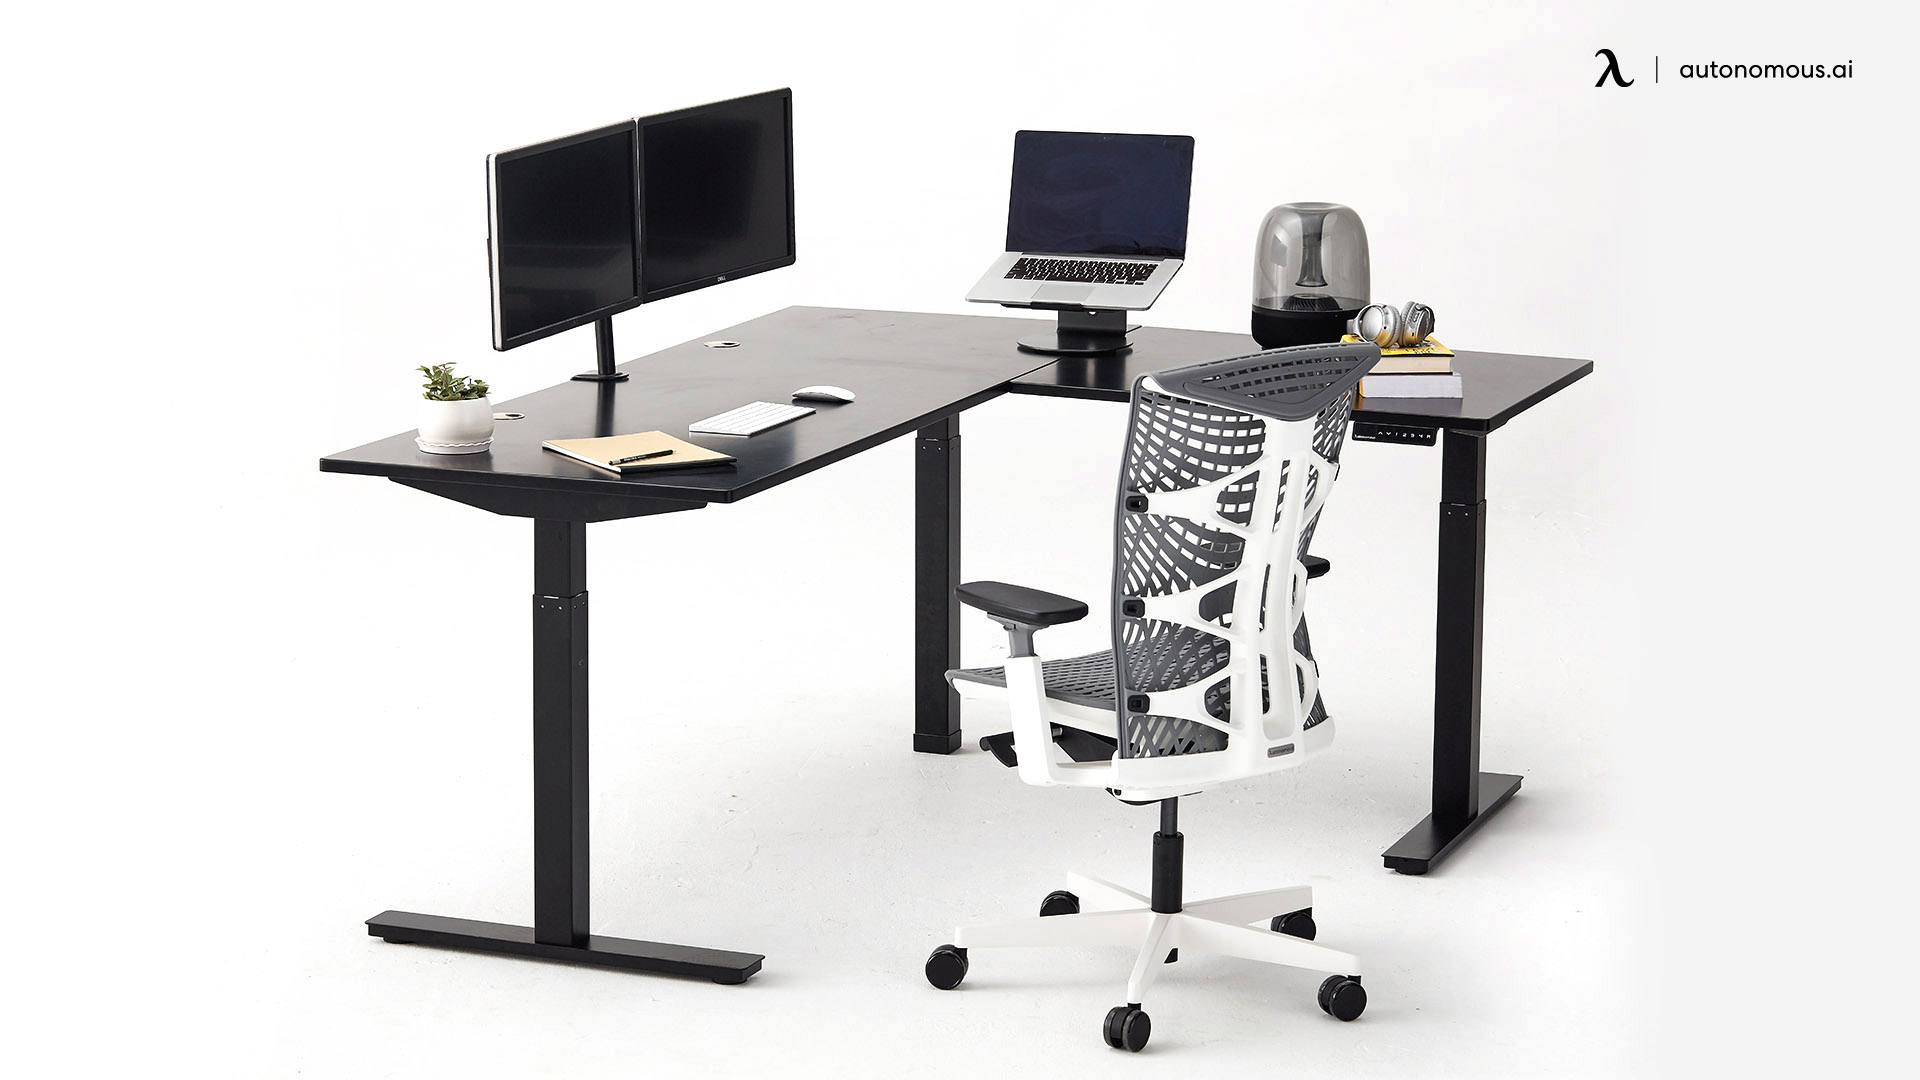 The L-shaped Smart Desk